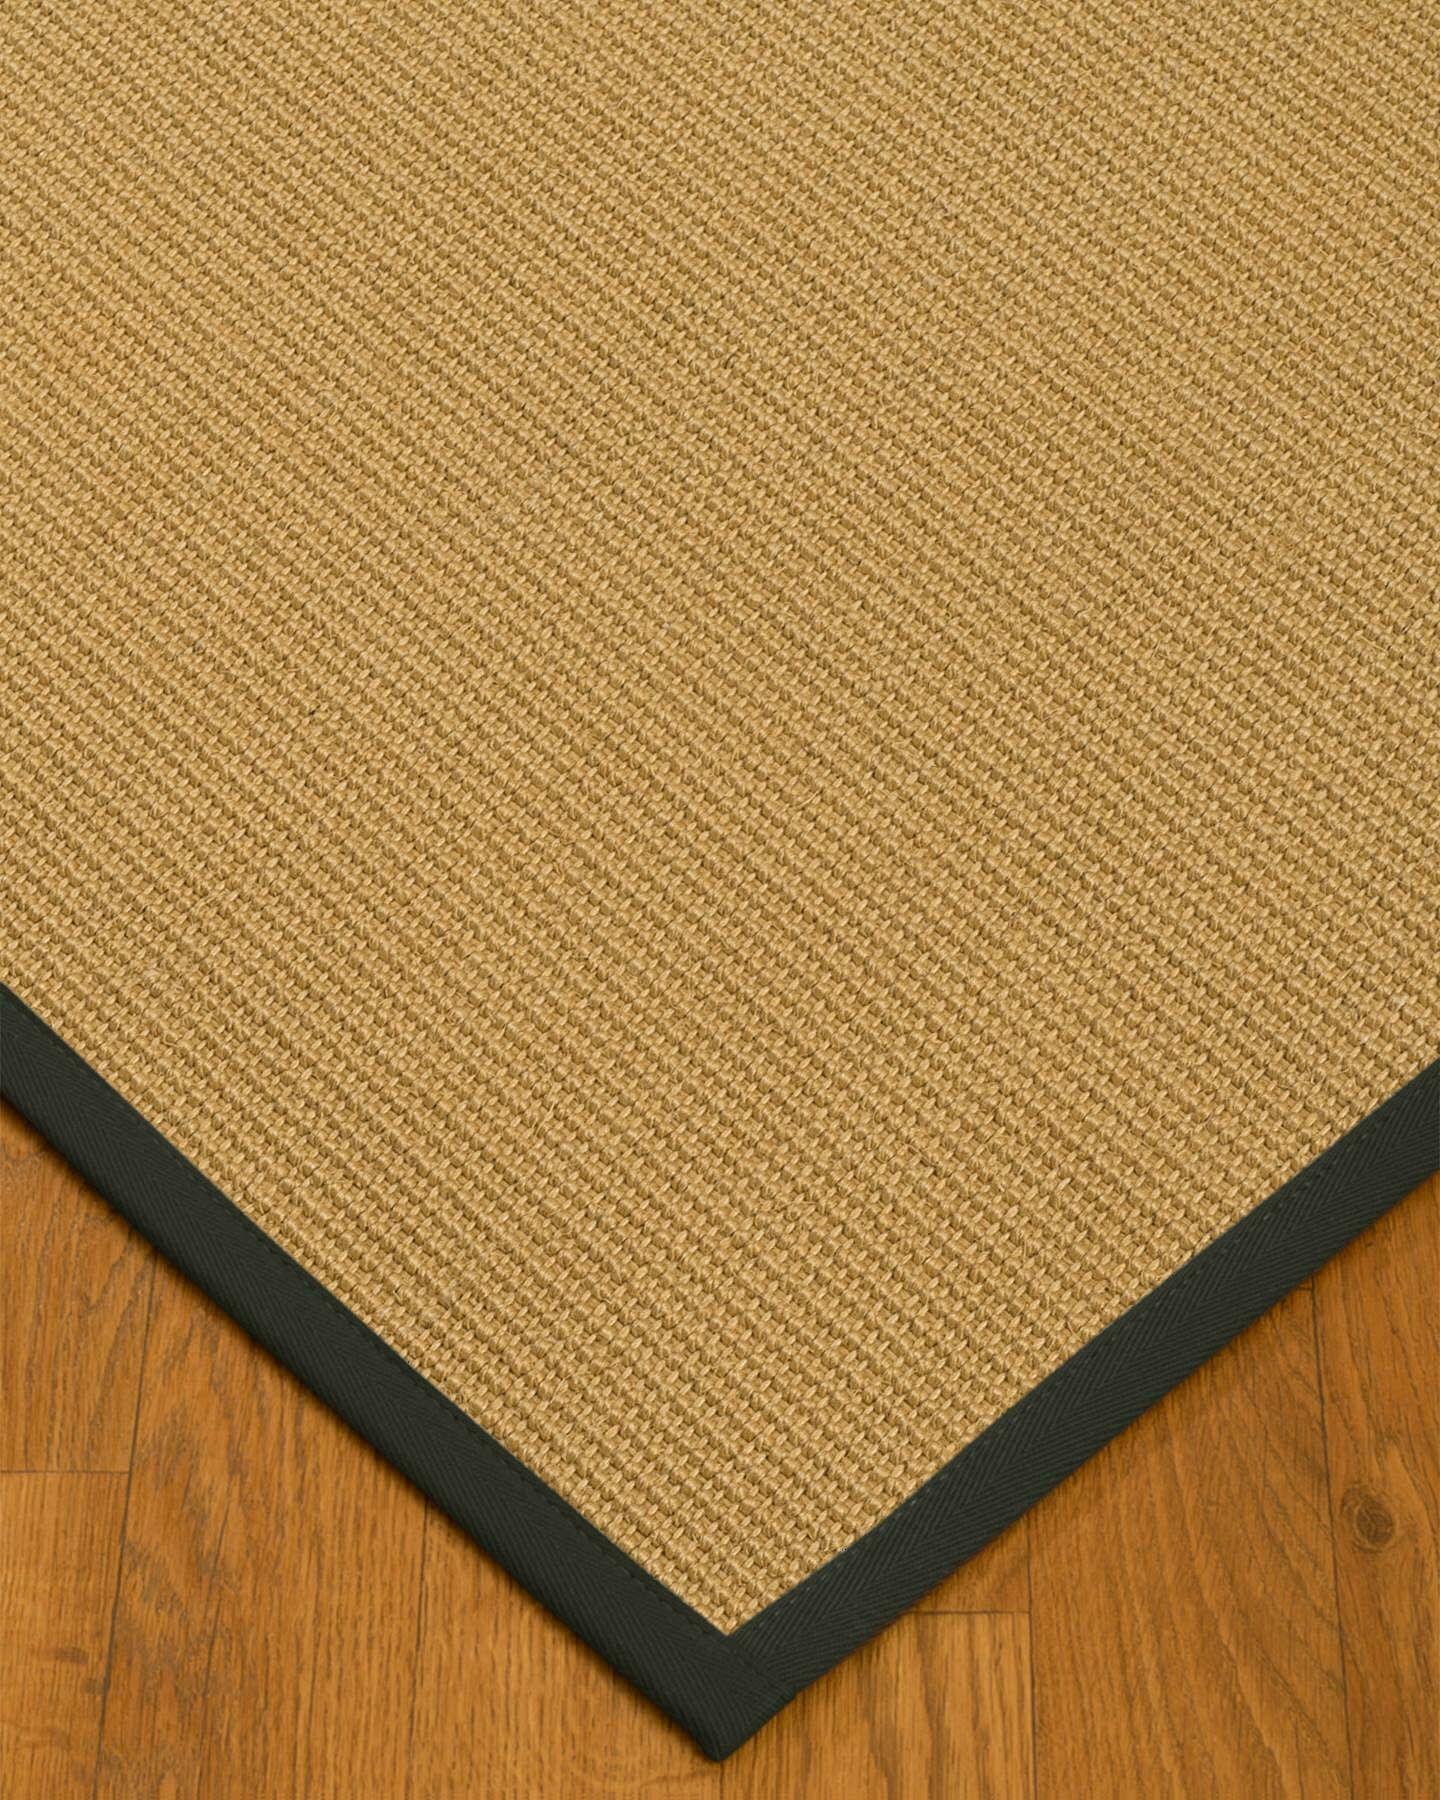 Astley Hand Woven Beige Area Rug Rug Size: Rectangle 6' x 9'